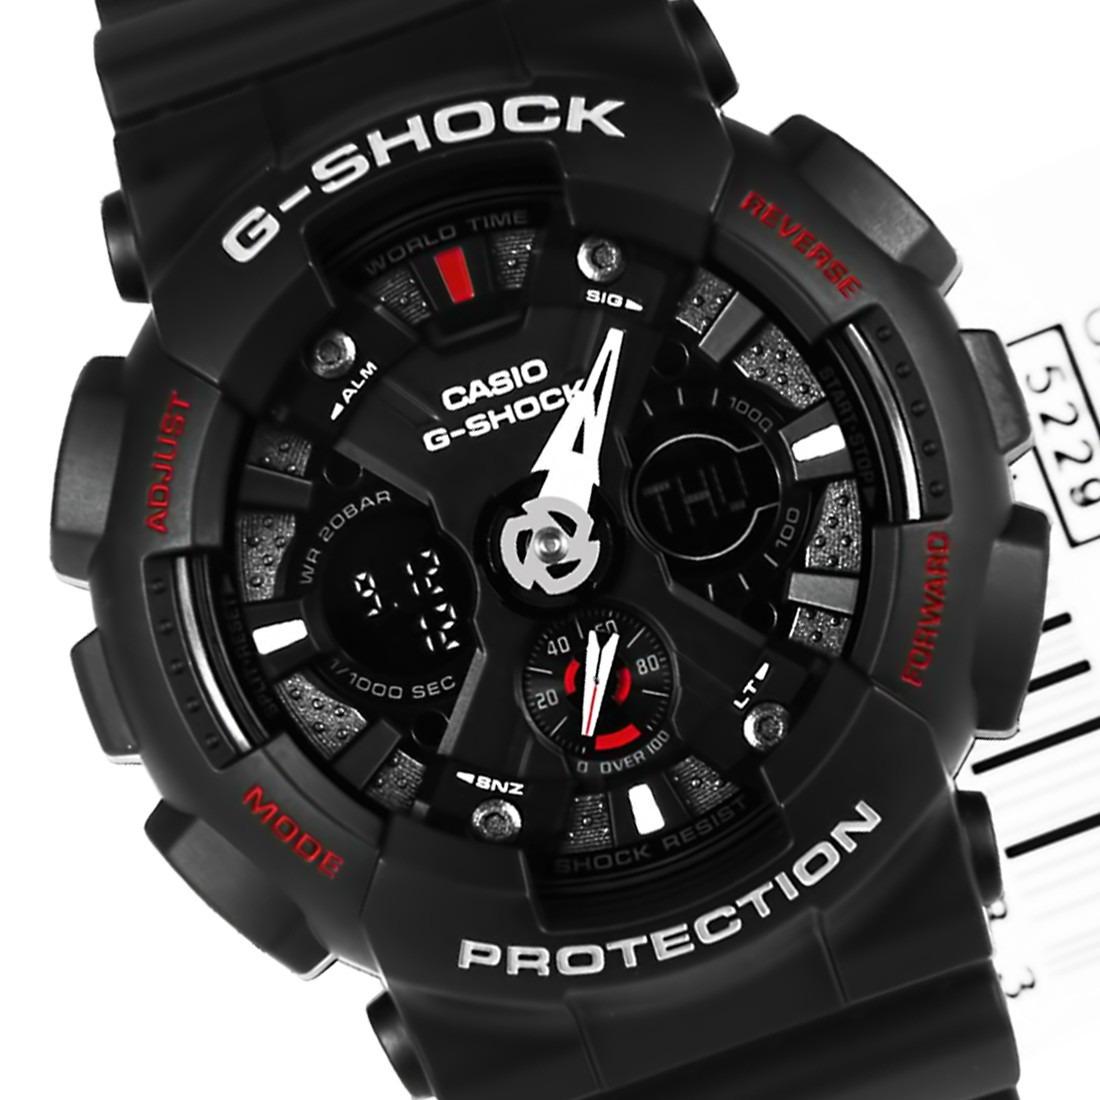 Relógio Casio G Shock Preto GA-300-1A - galleryrock